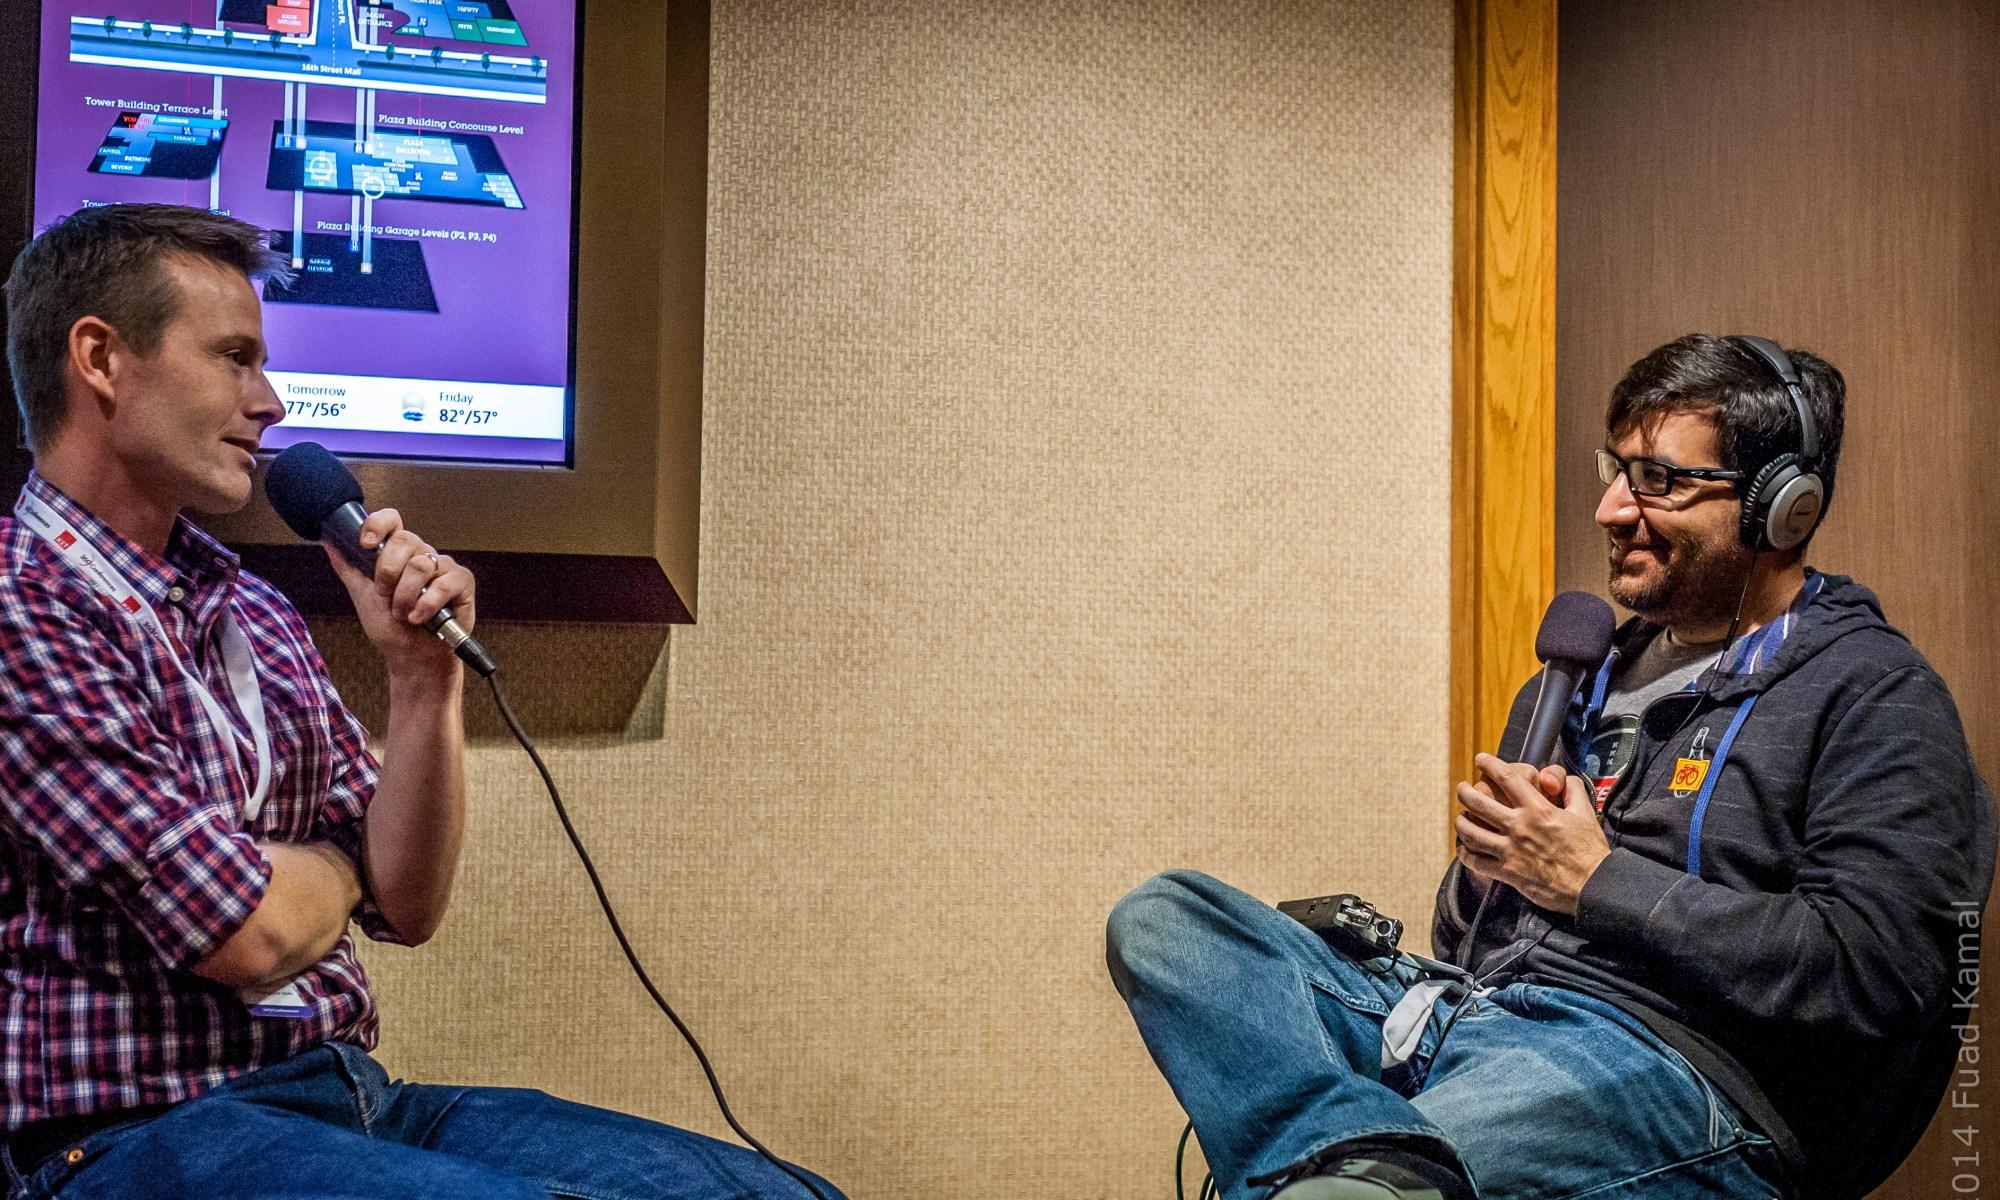 Jay Thrash (@jaythrash) is interviewed on the NSBrief podcast by Saul Mora (@casademora) during 360iDev